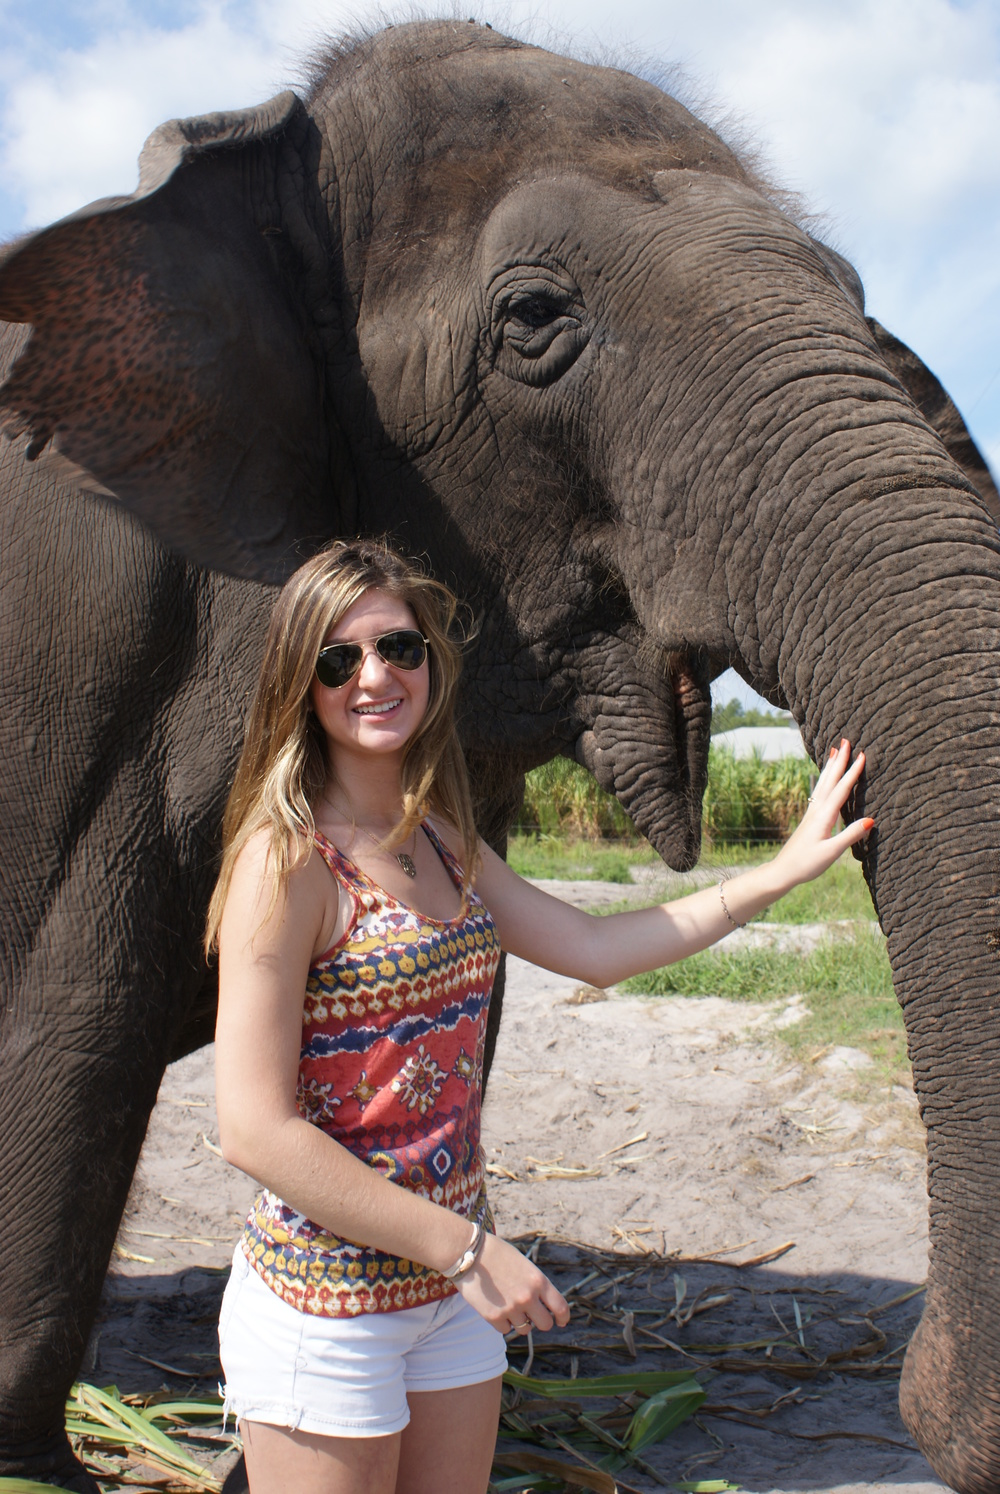 Elephant Conservation Ctr Aug 2014 060.JPG